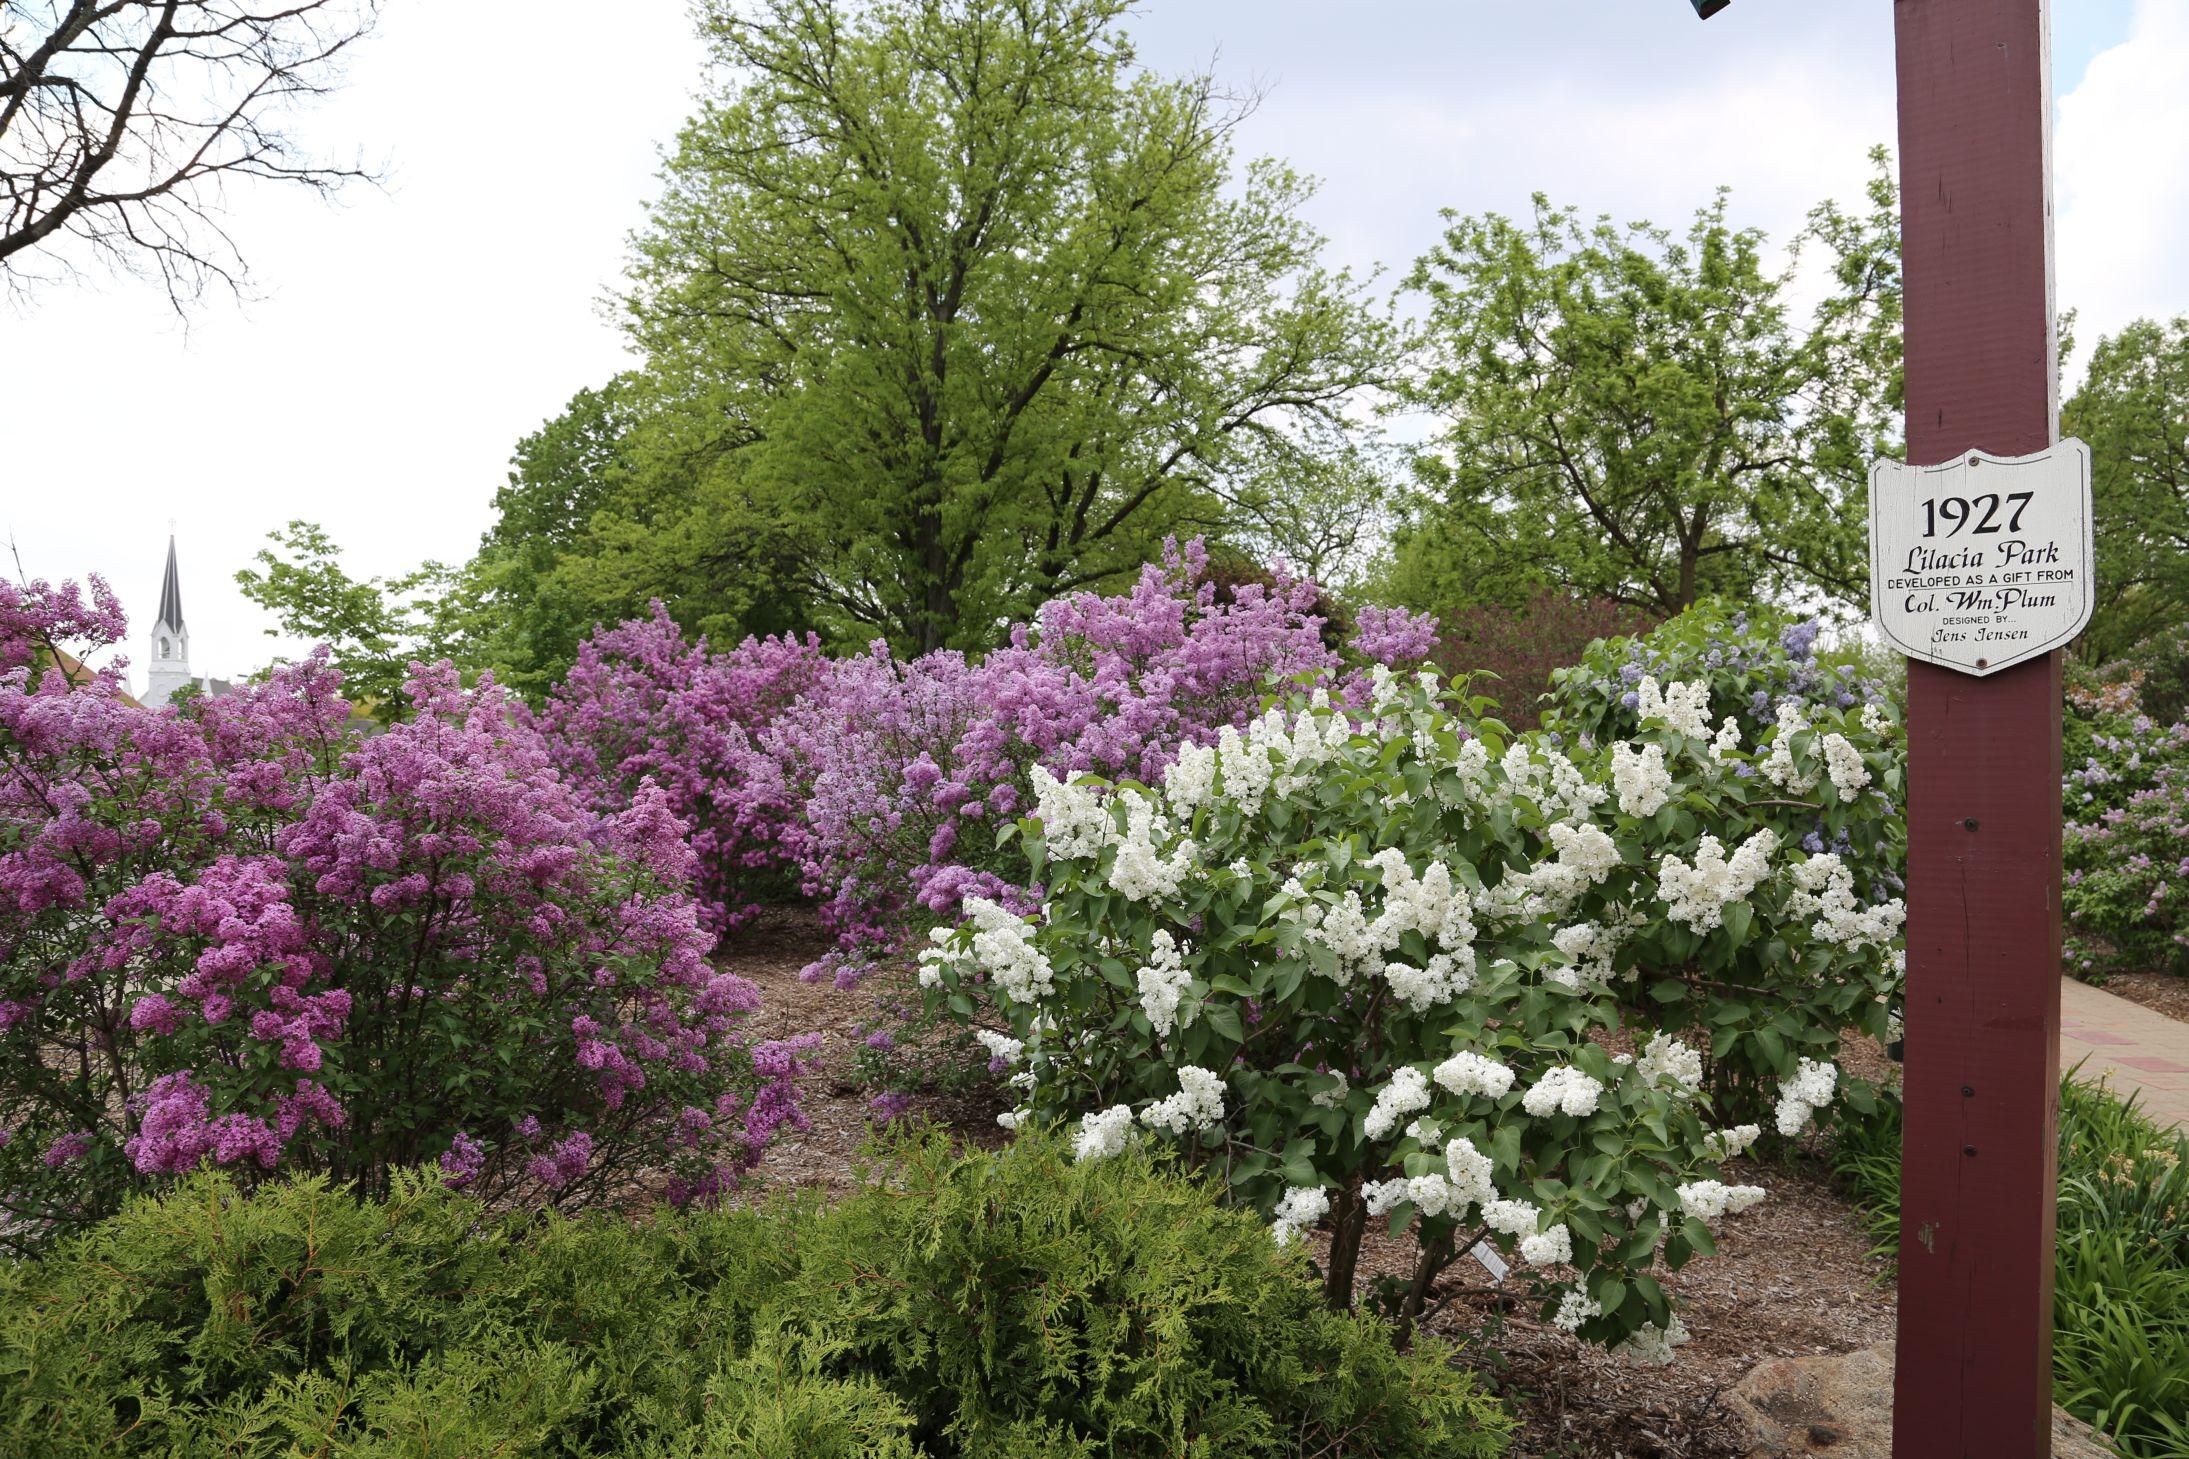 Lilacia Park, Lombard, Illinois